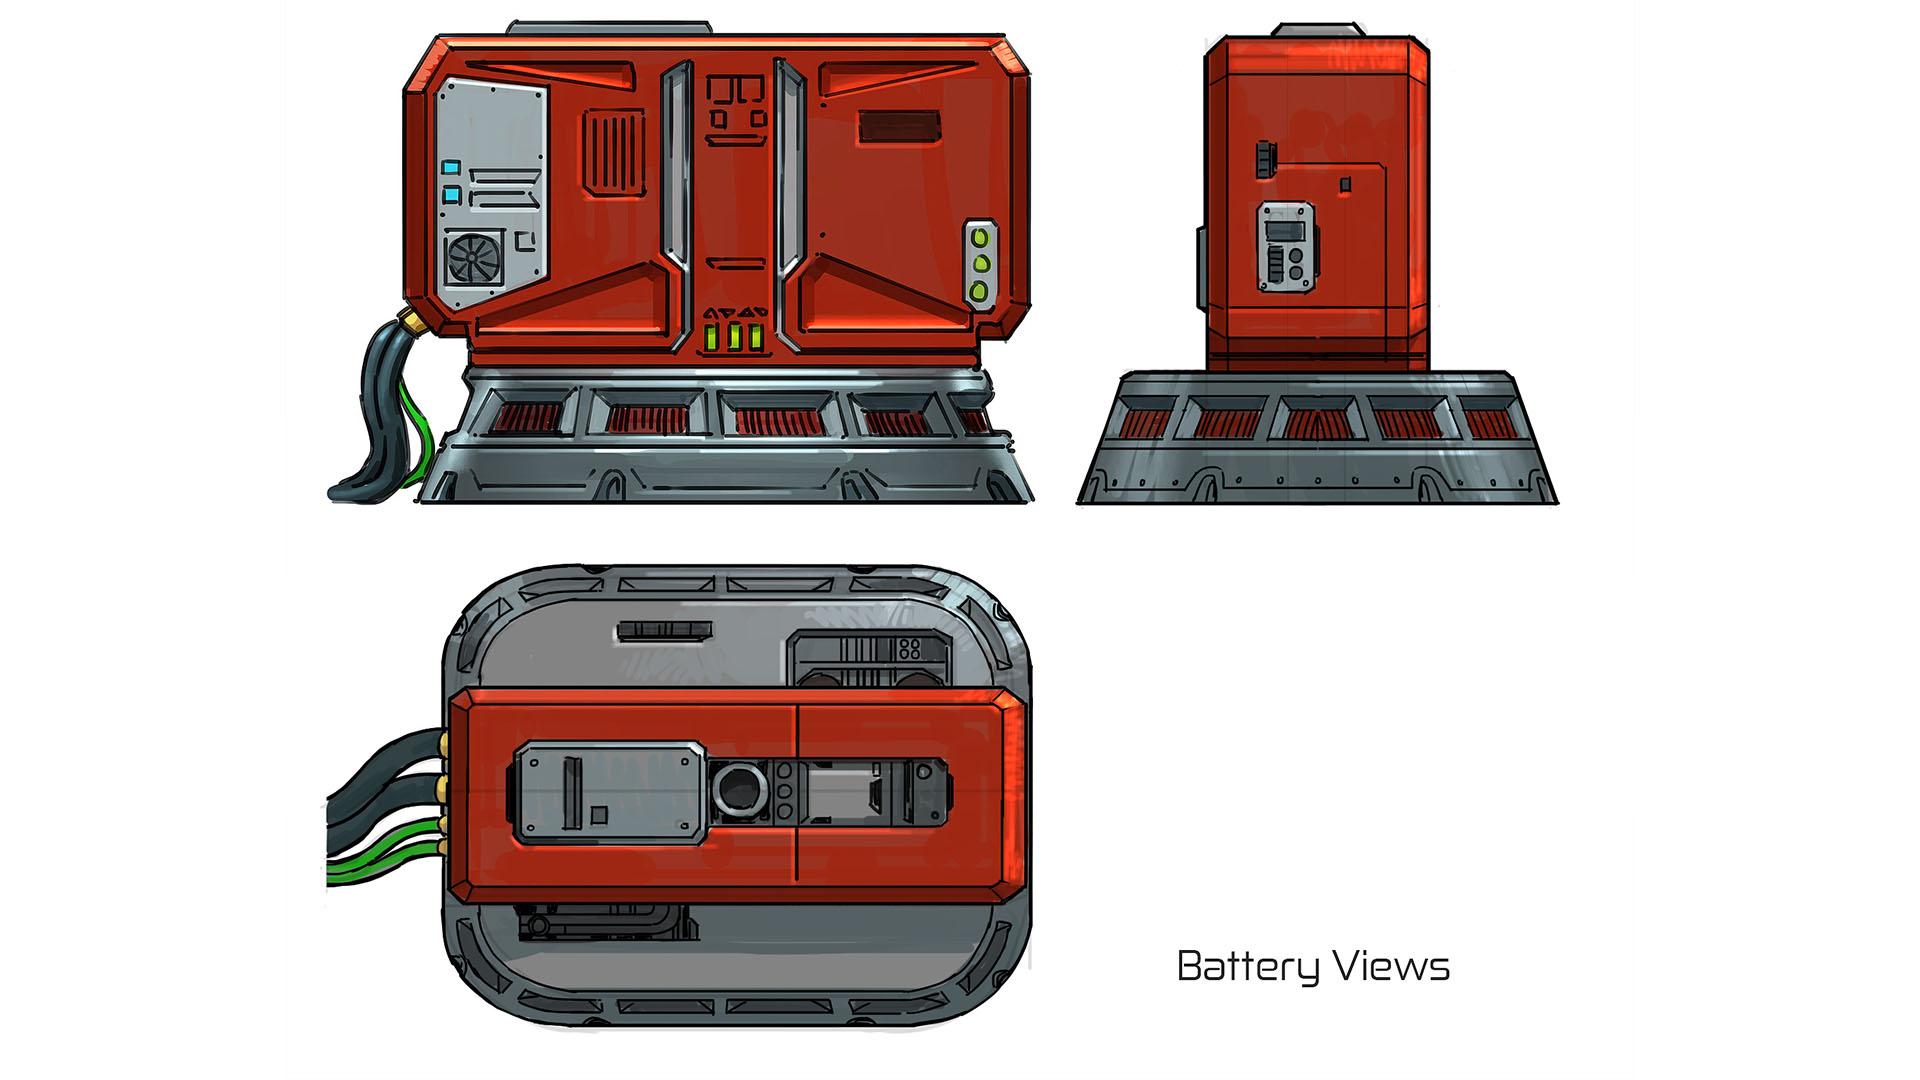 battery views